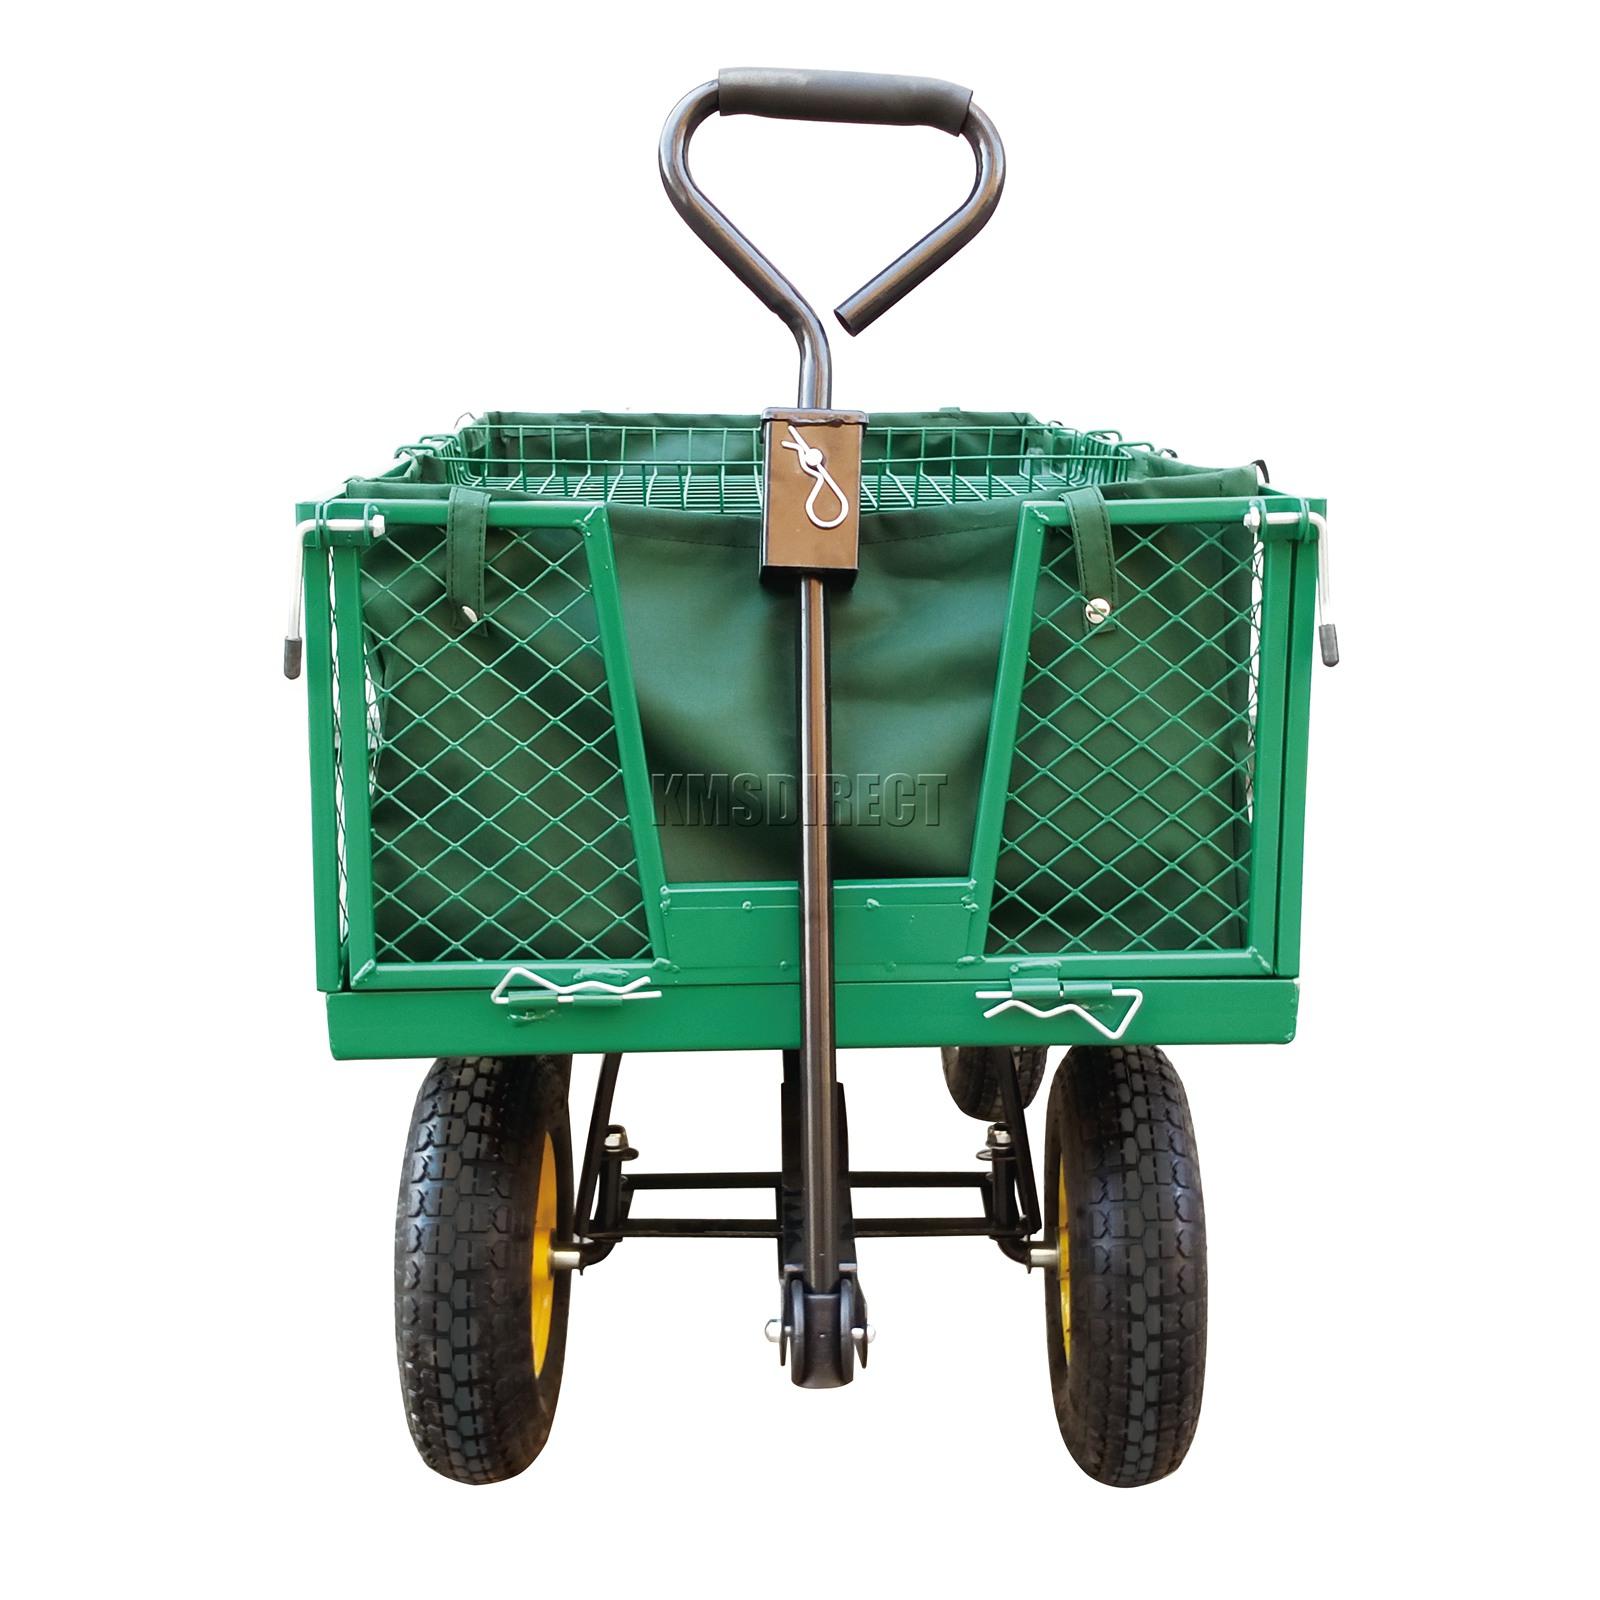 FoxHunter-Heavy-Duty-Garden-Dump-Truck-Tipping-Trailer-Trolley-Cart-Wheelbarrow miniatuur 22